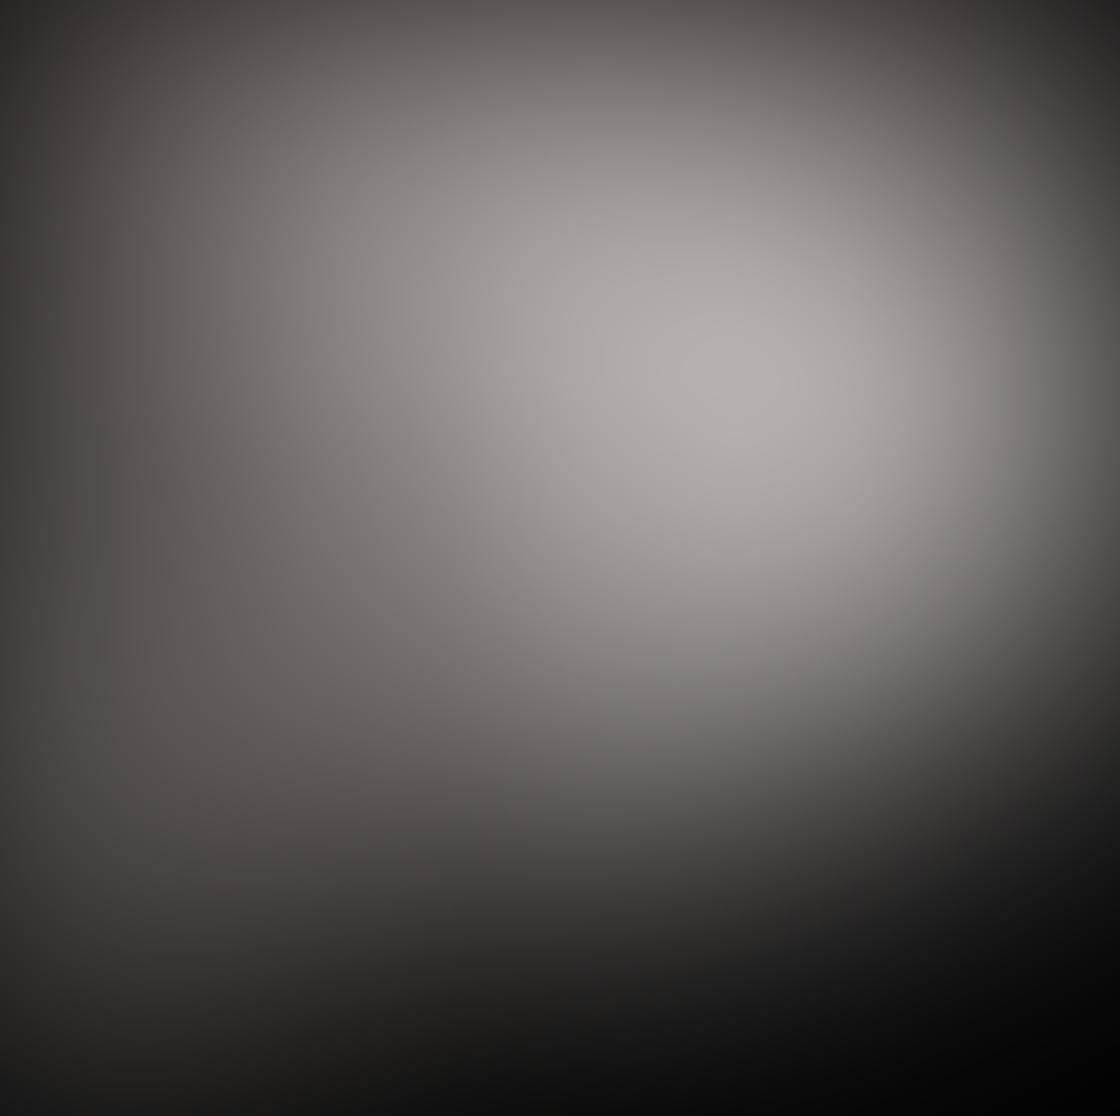 iPhone Photo Shadows 25